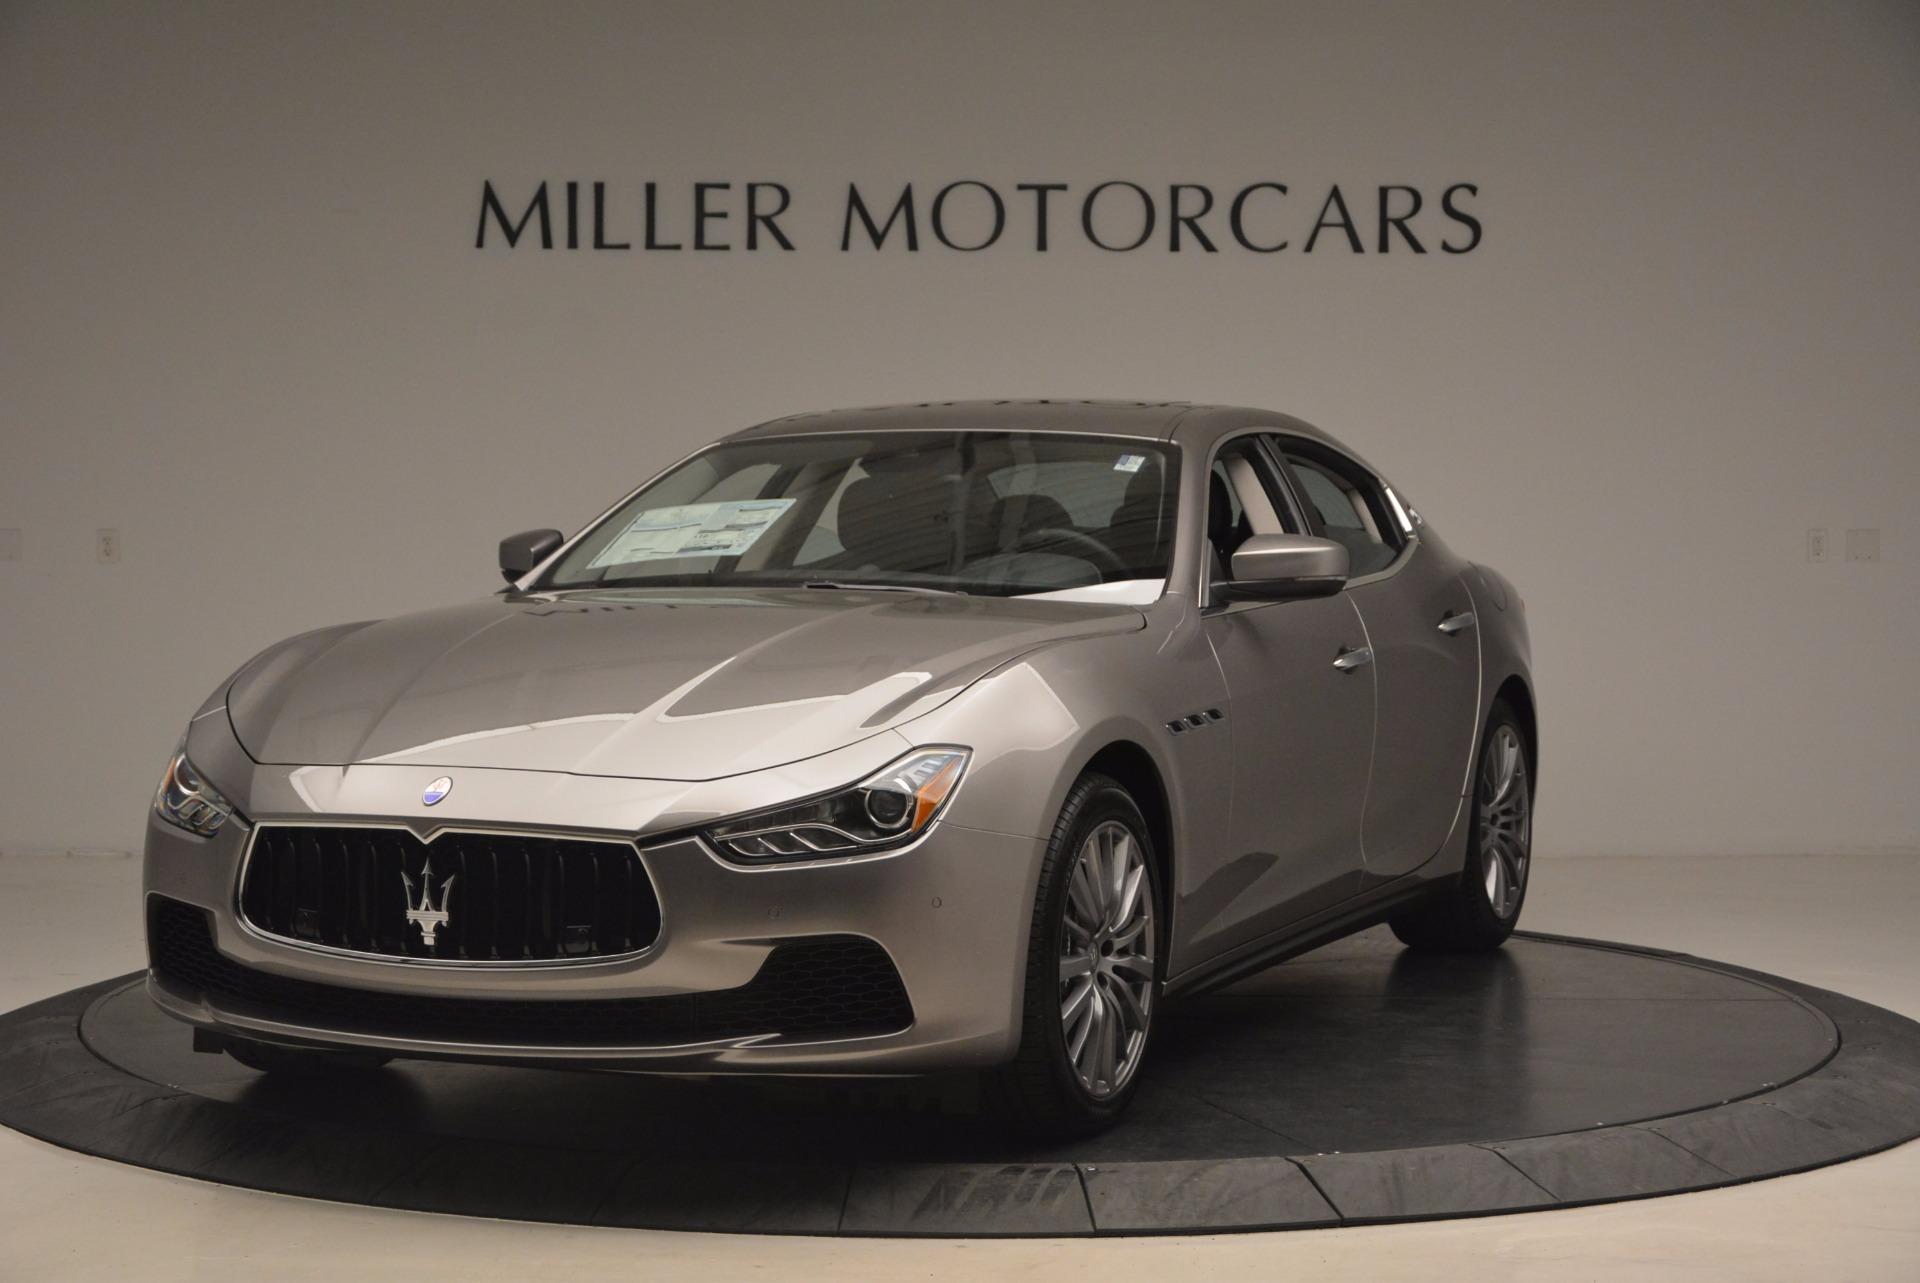 New 2017 Maserati Ghibli SQ4 for sale Sold at Alfa Romeo of Greenwich in Greenwich CT 06830 1